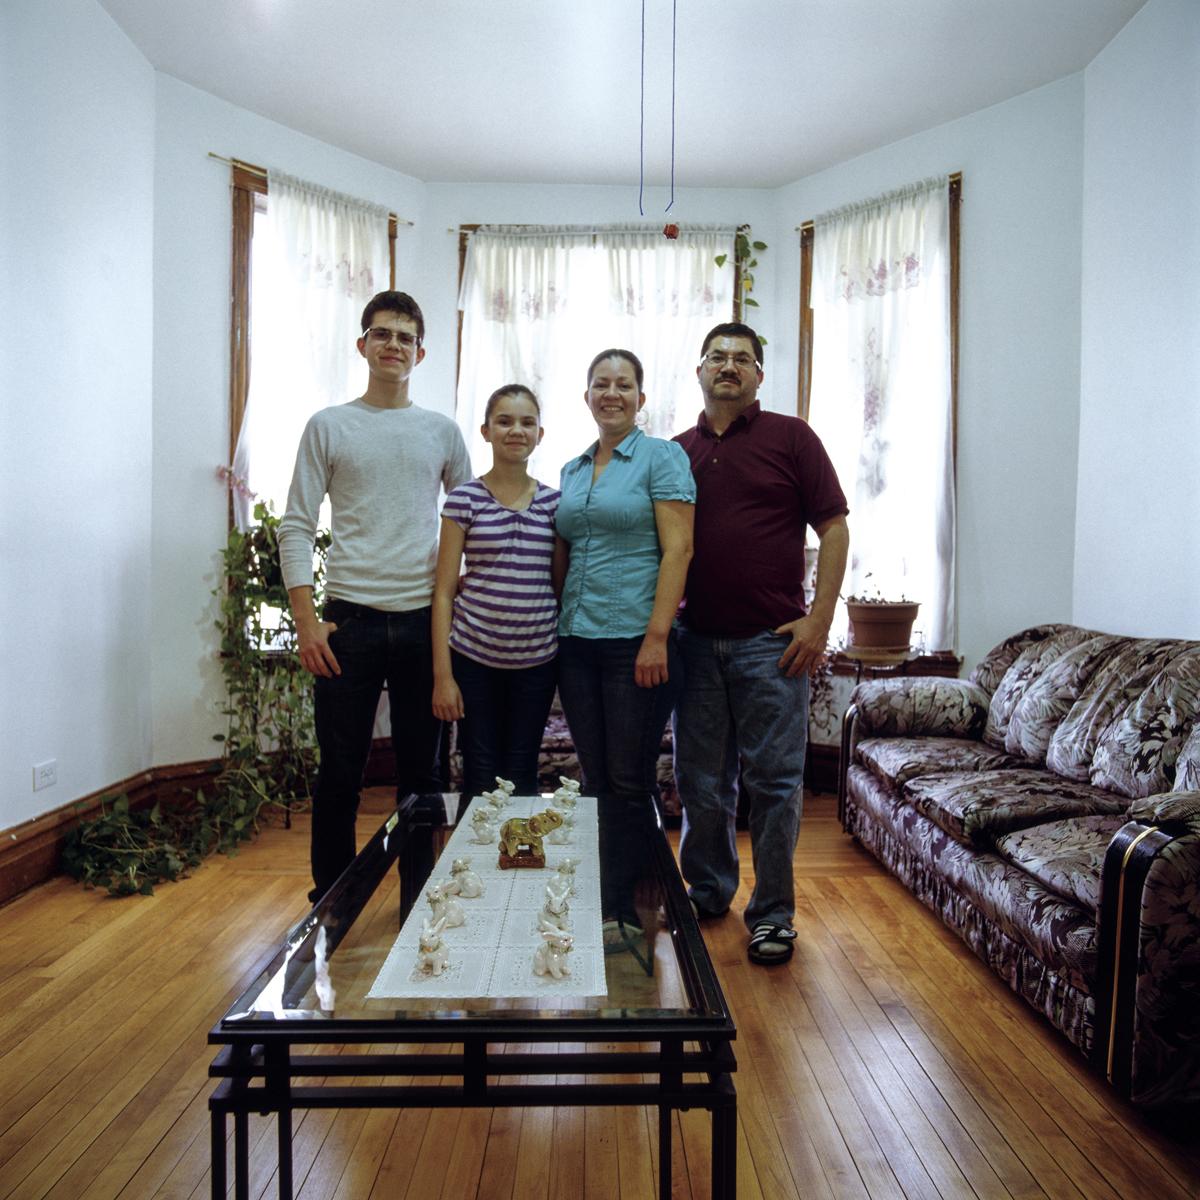 Zandra_Ramiro_Family_Frame10_inverted_10x10.jpg